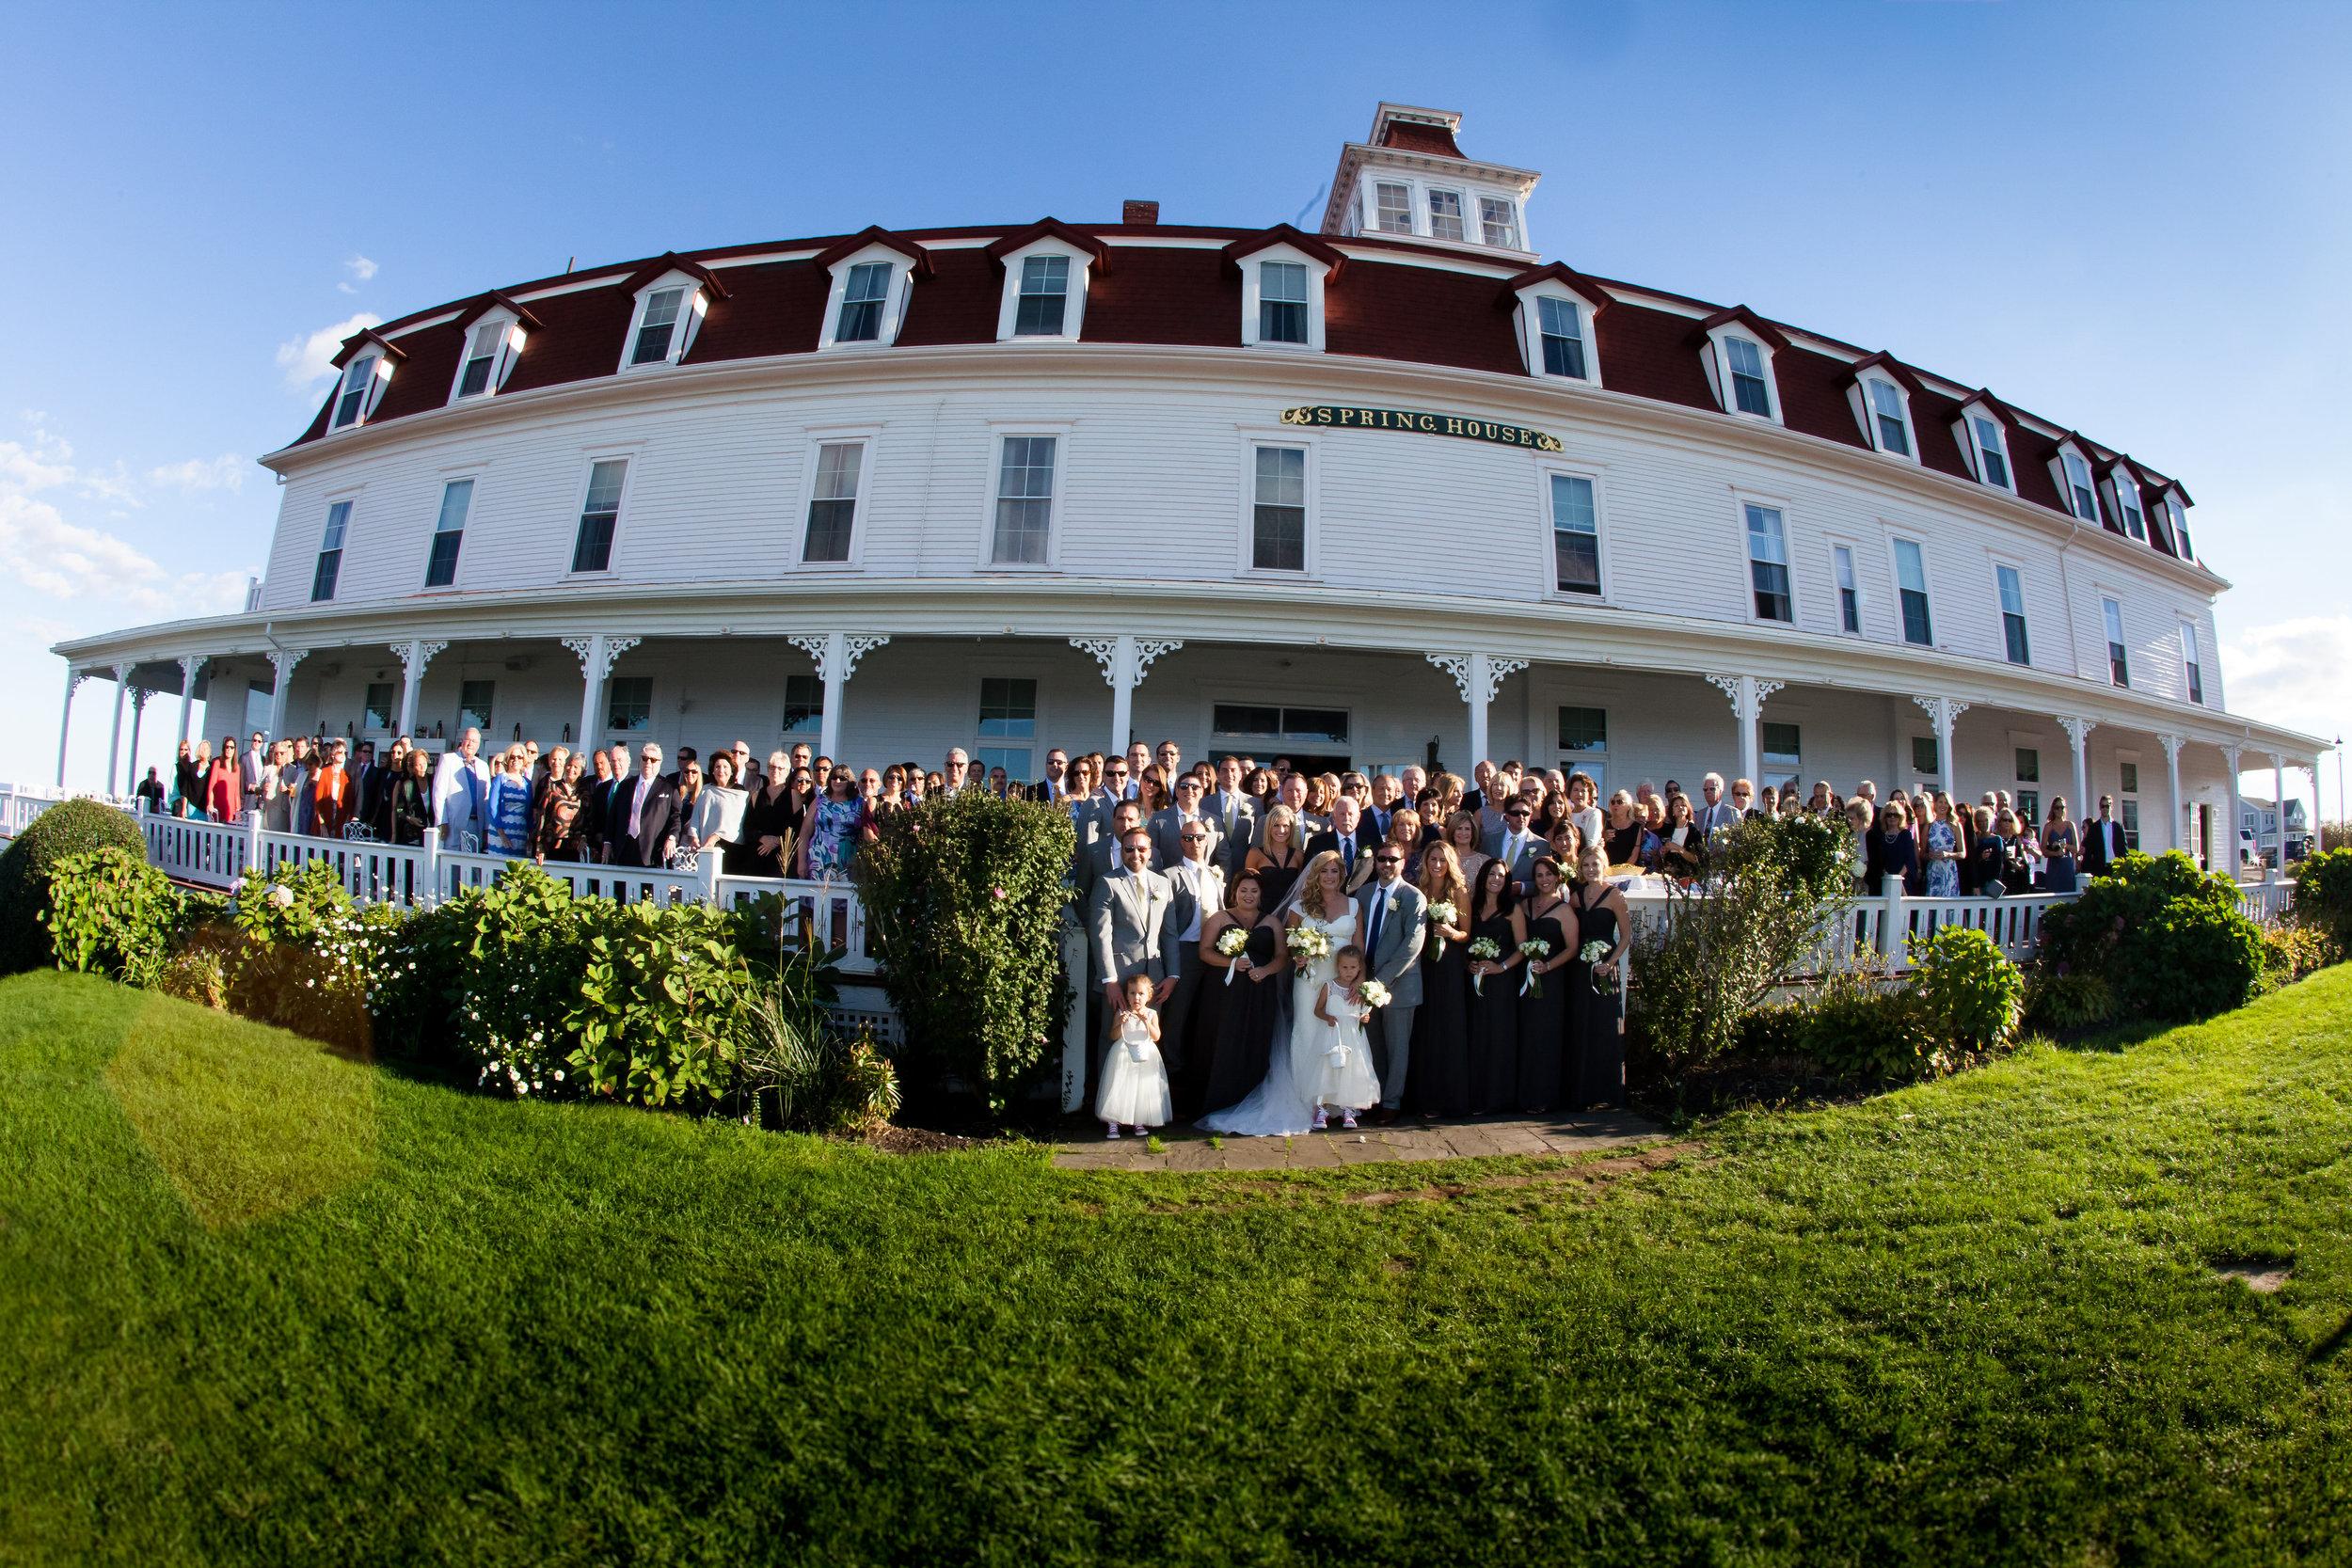 block-island-destinatiion-wedding-722.jpg